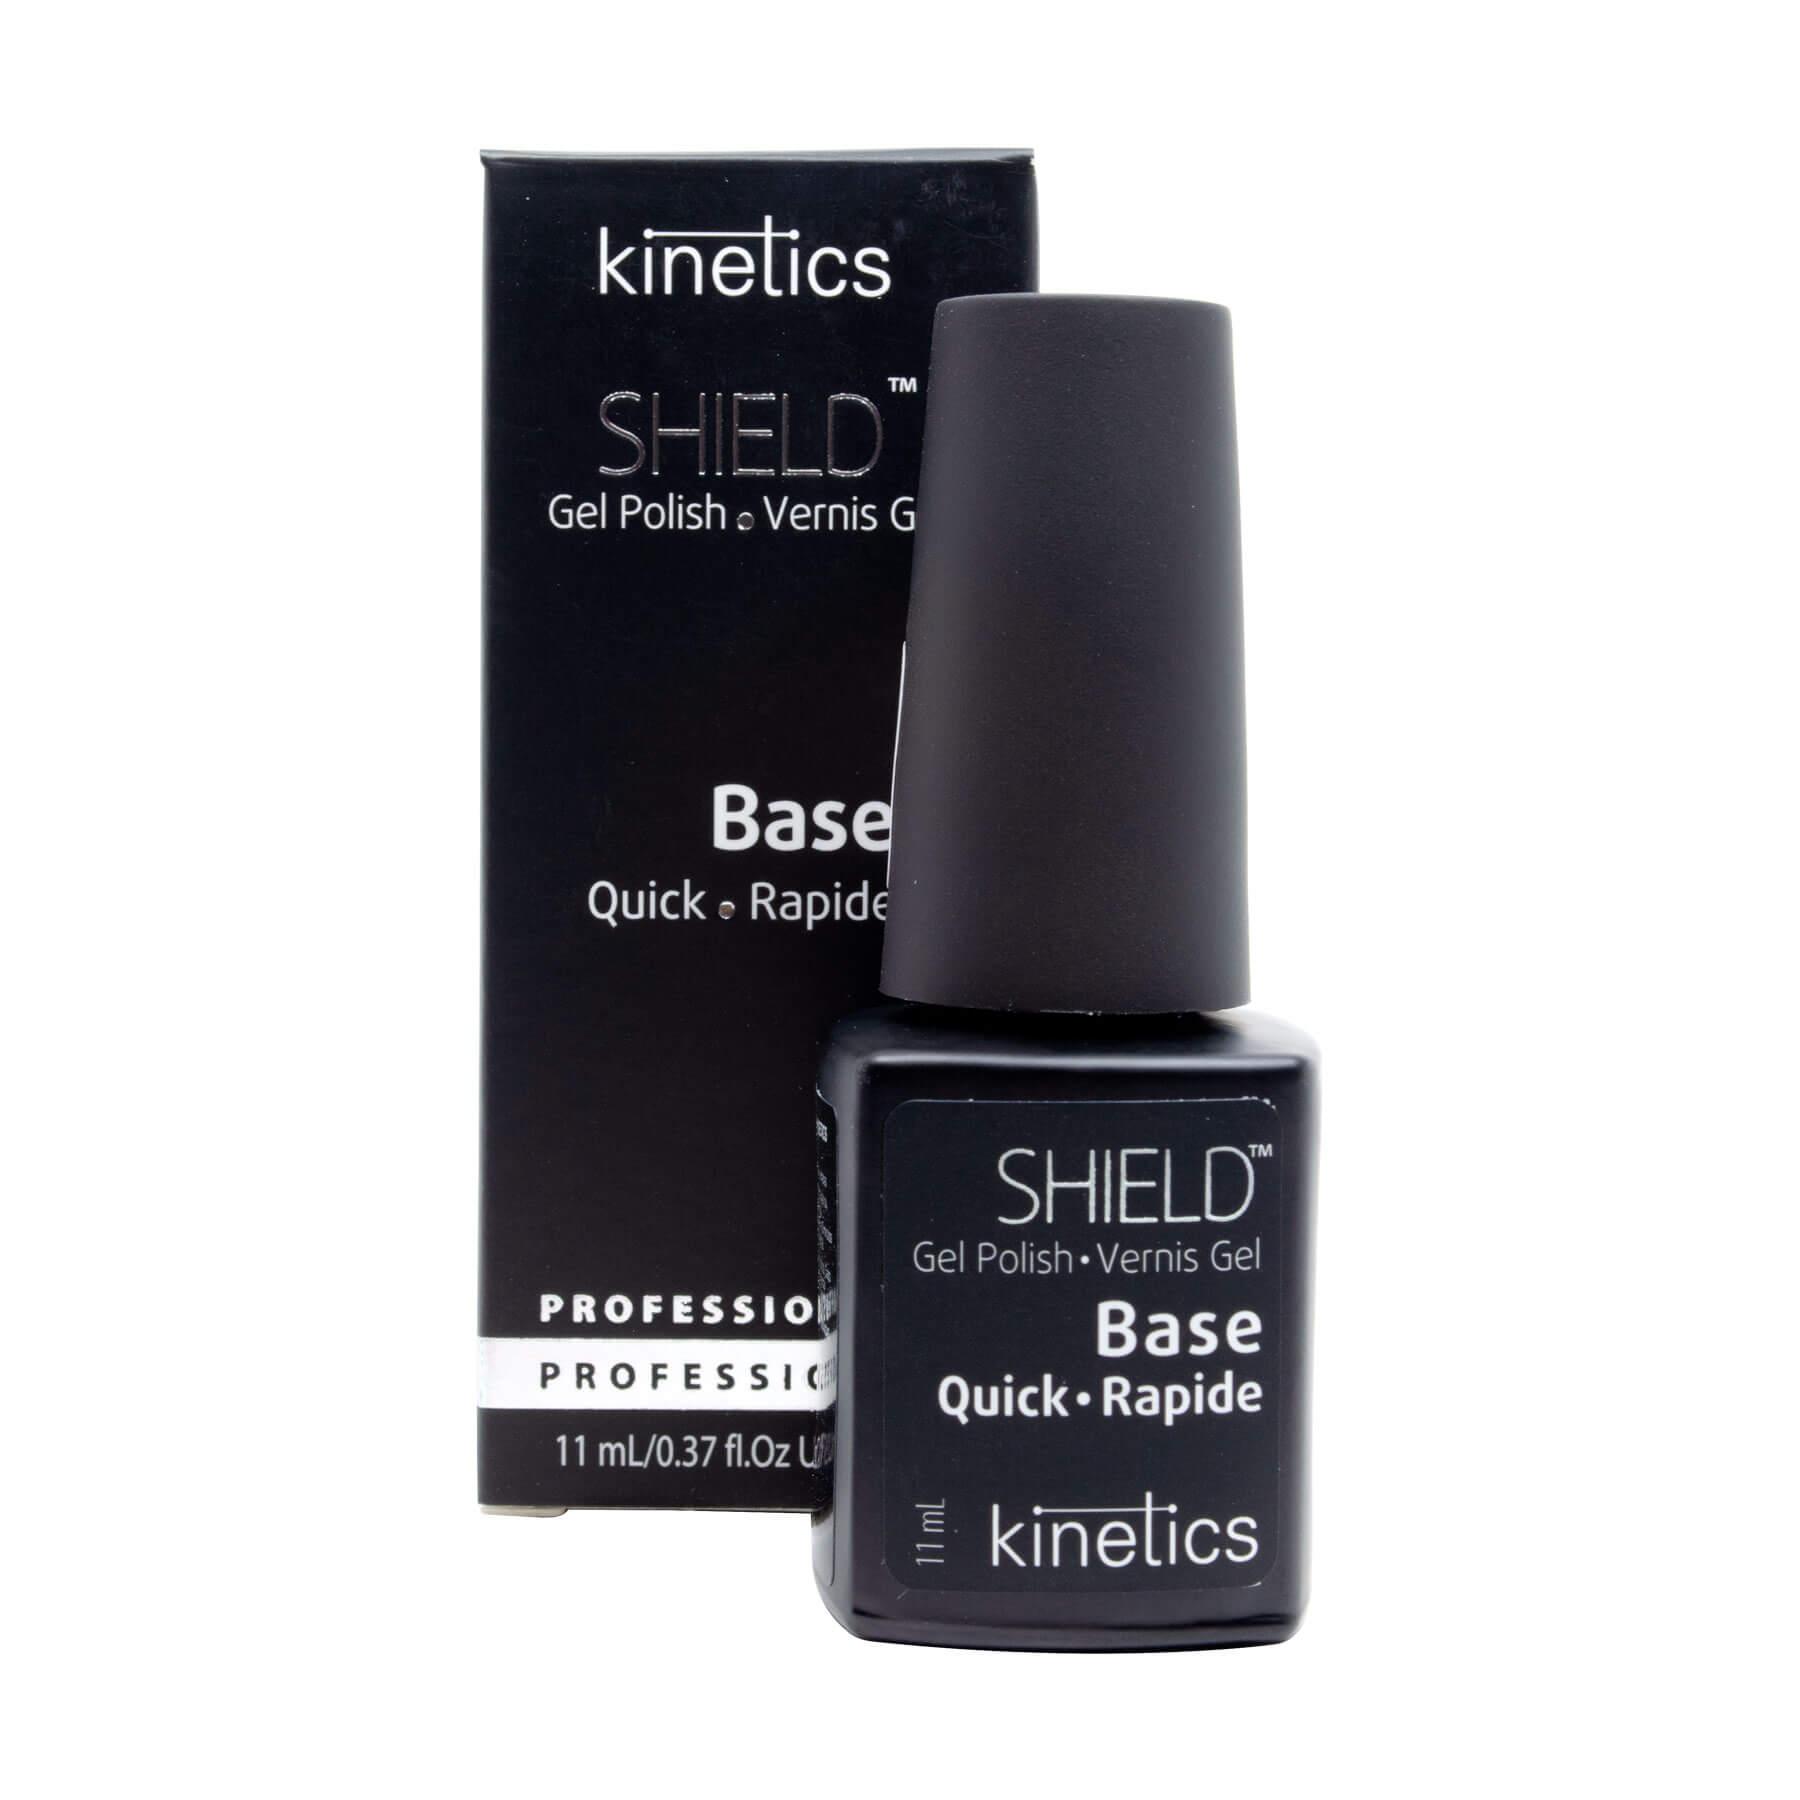 Shield Gel Polish Quick Base Kinetics 11ml